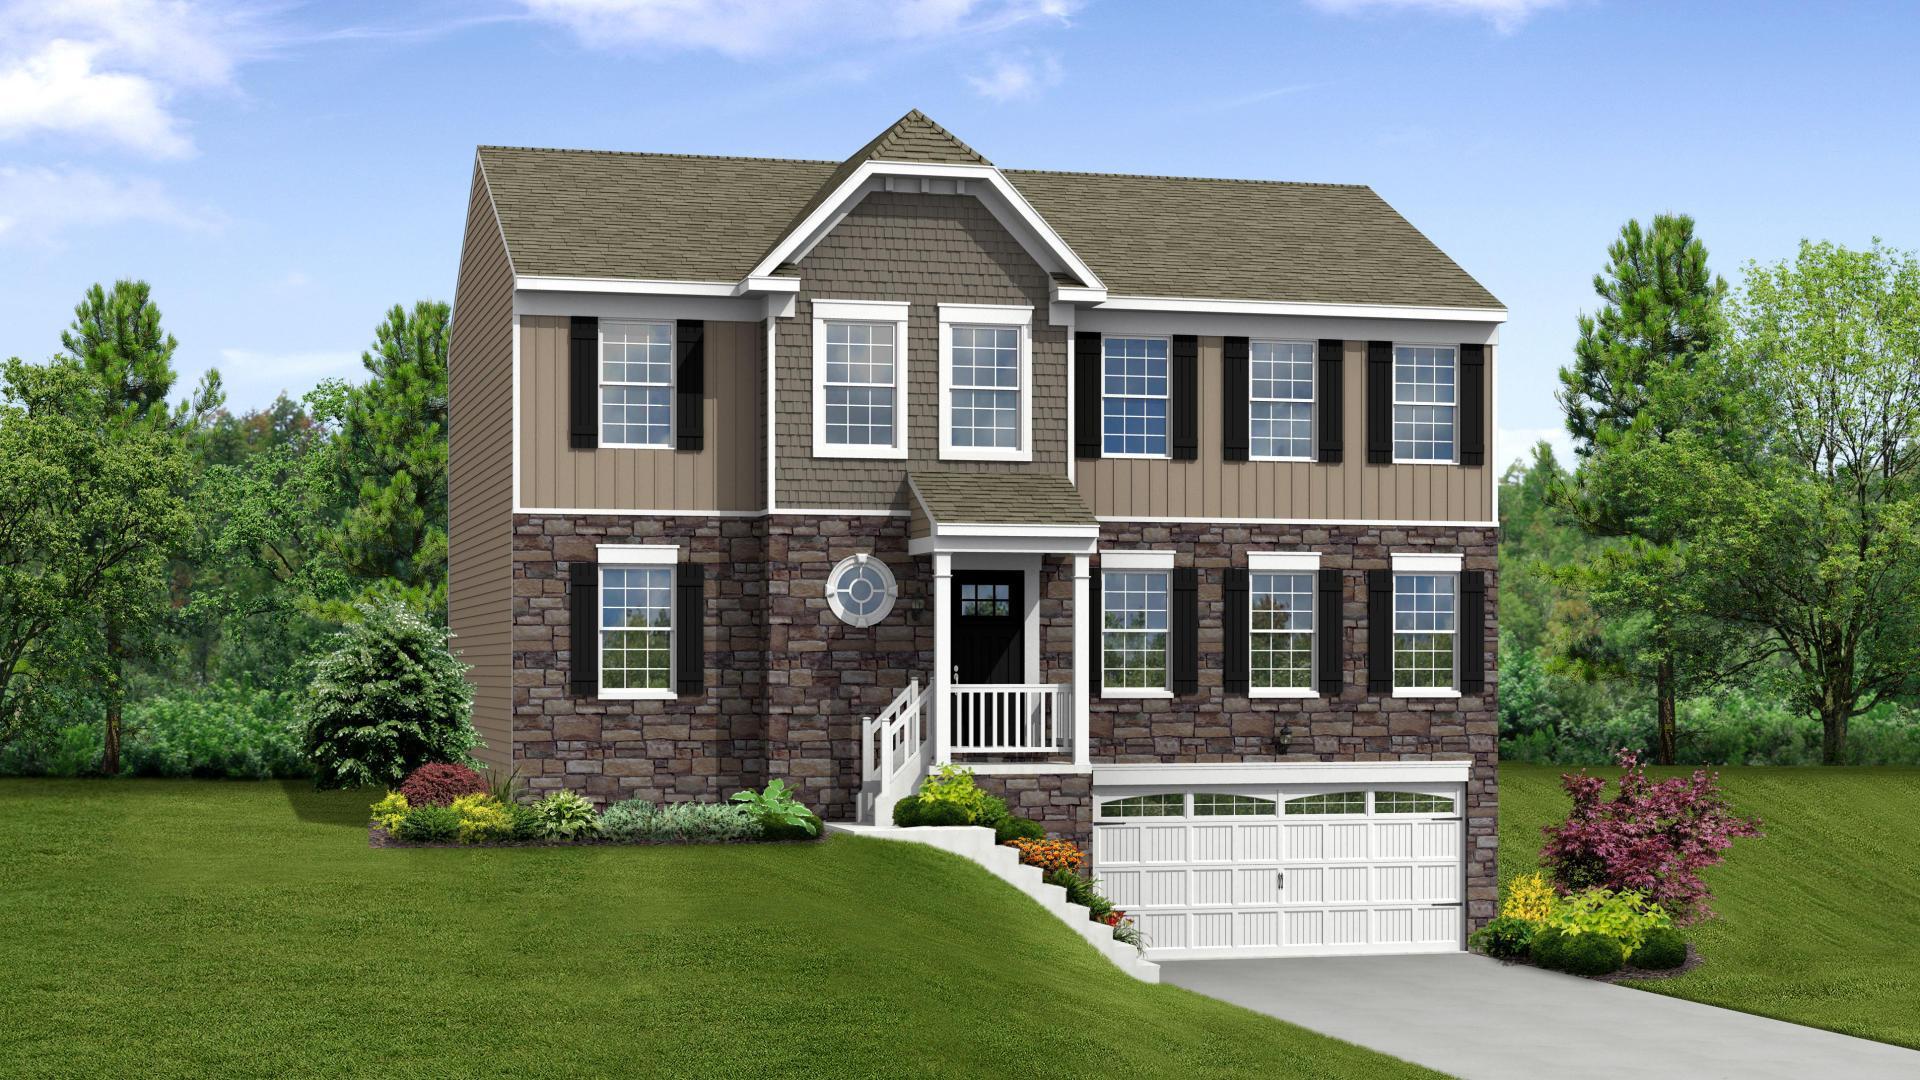 Exterior:Elevation: A Opt New England Inspired Facade, Porch, & Garage Door